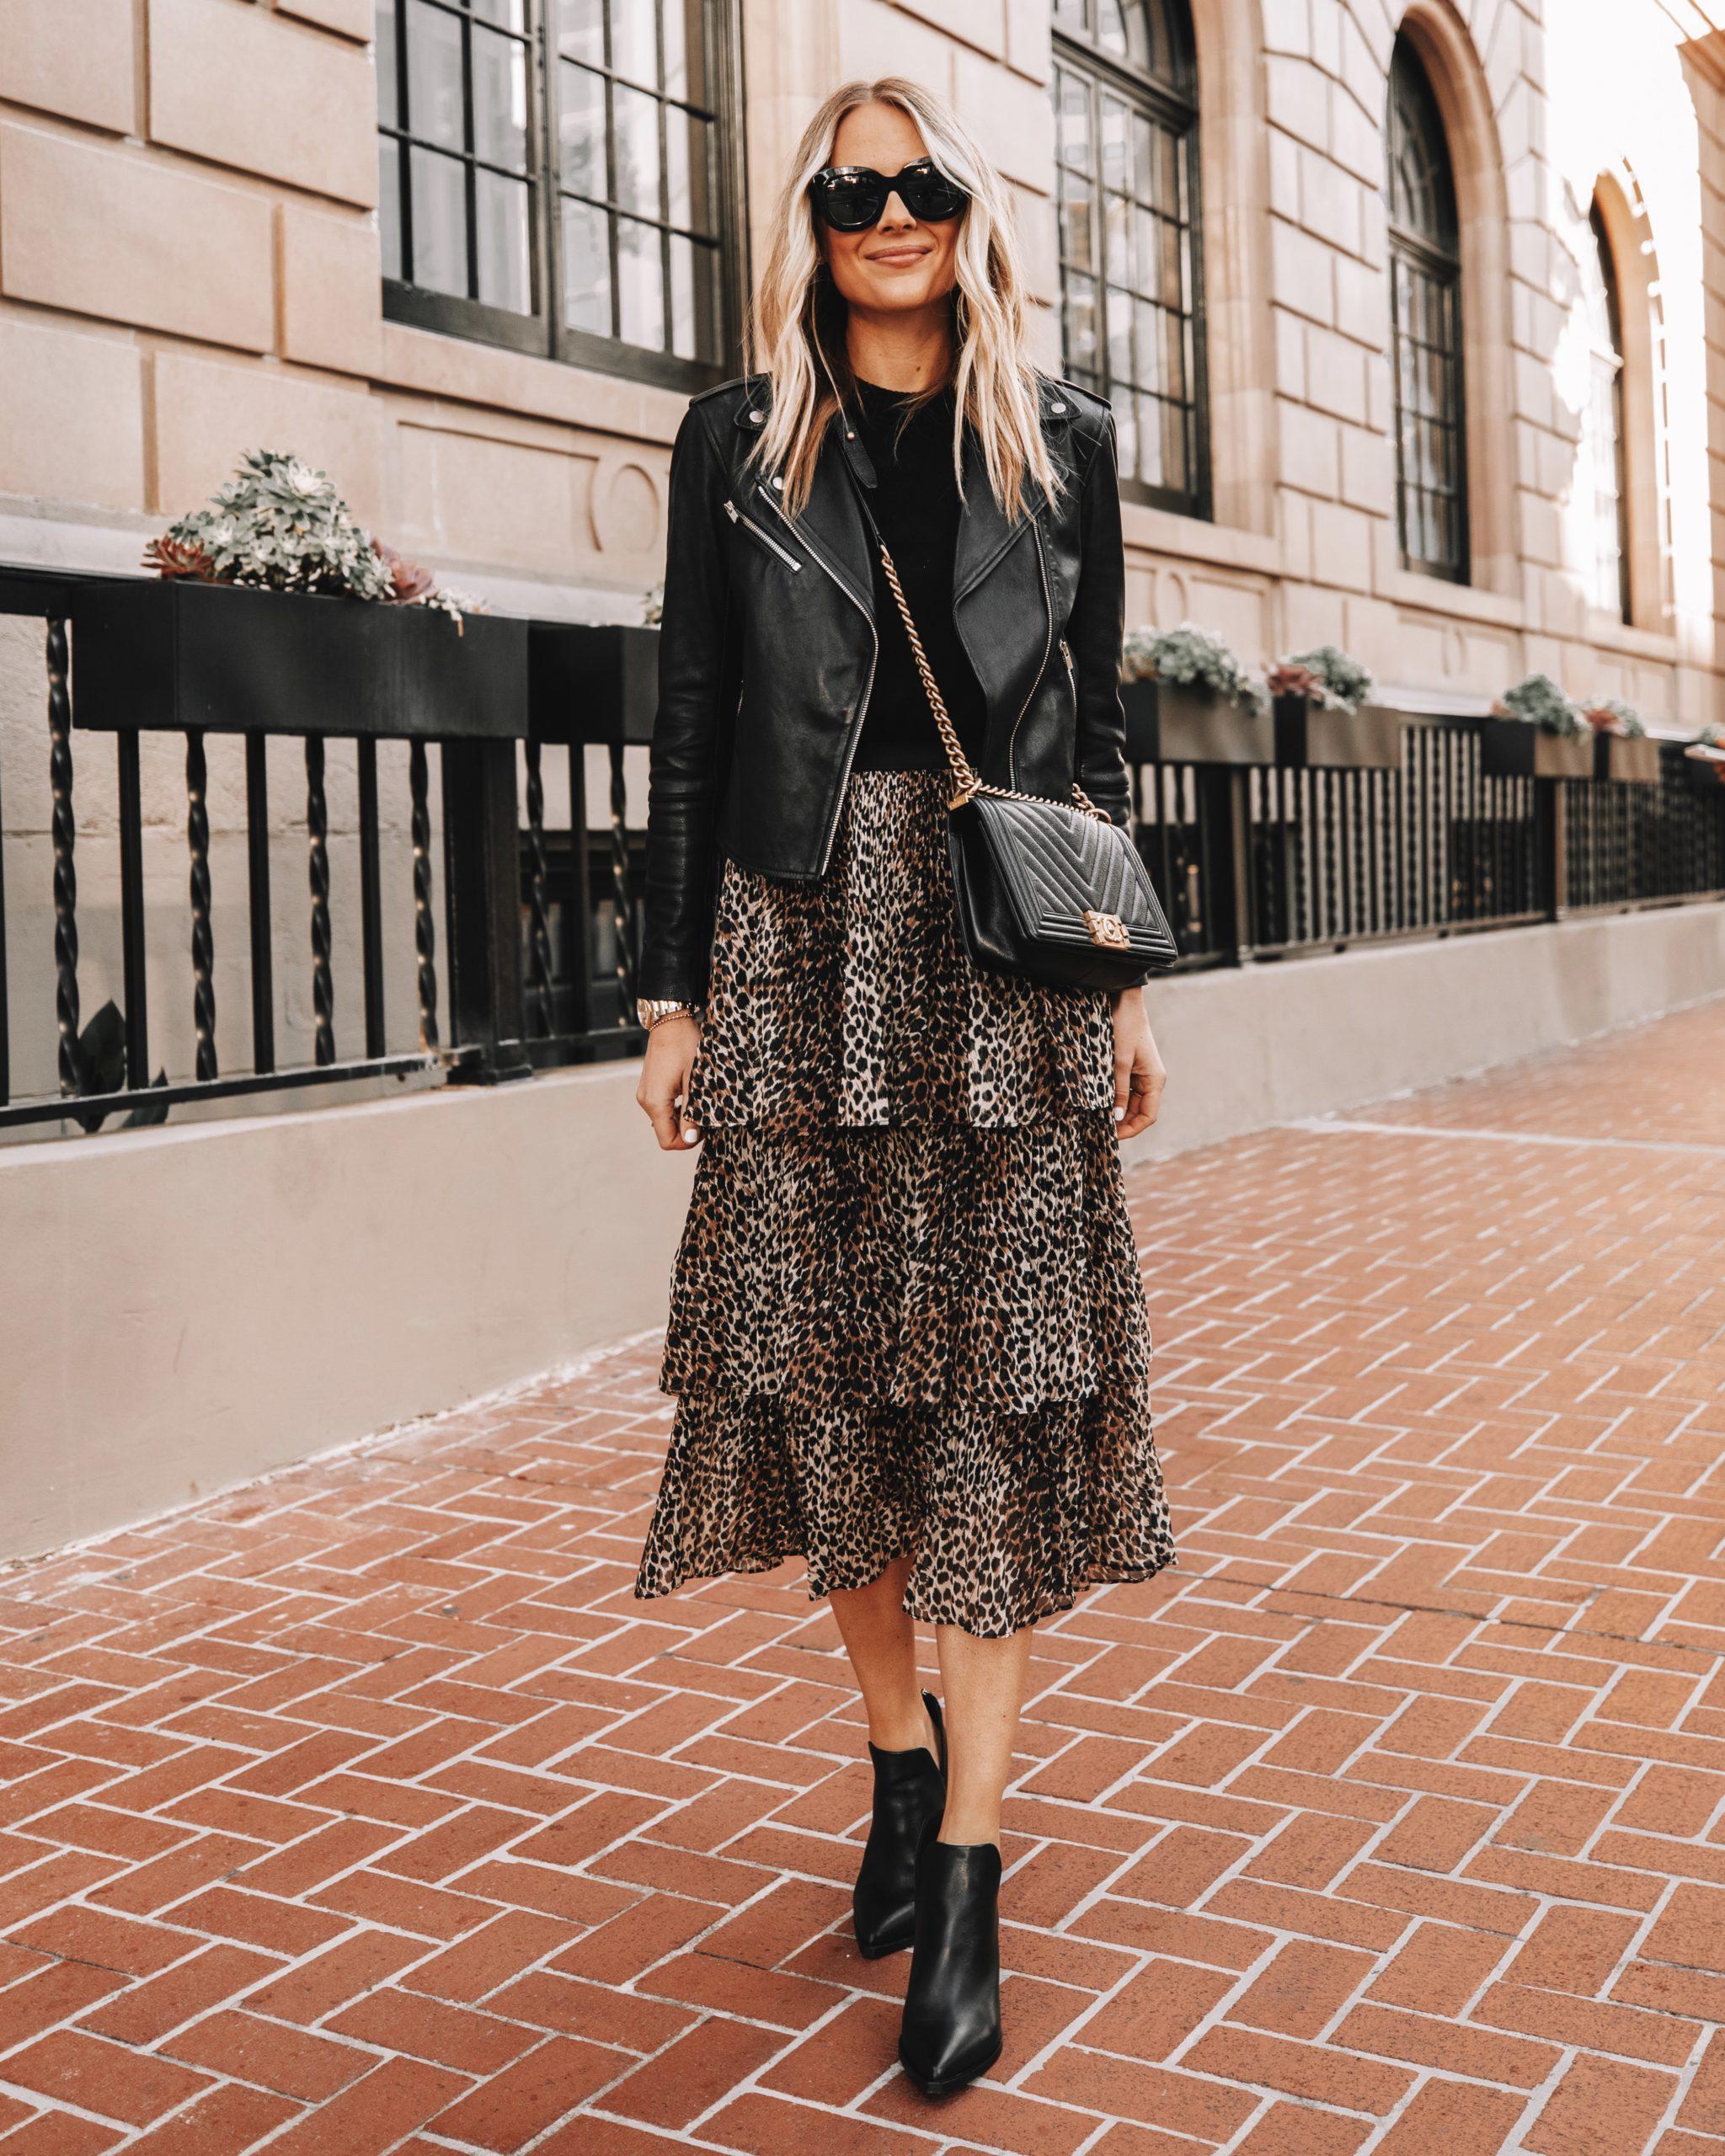 Fashion Jackson Wearing Black Leather Jacket Topshop Leopard Midi Skirt Black Leather Booties